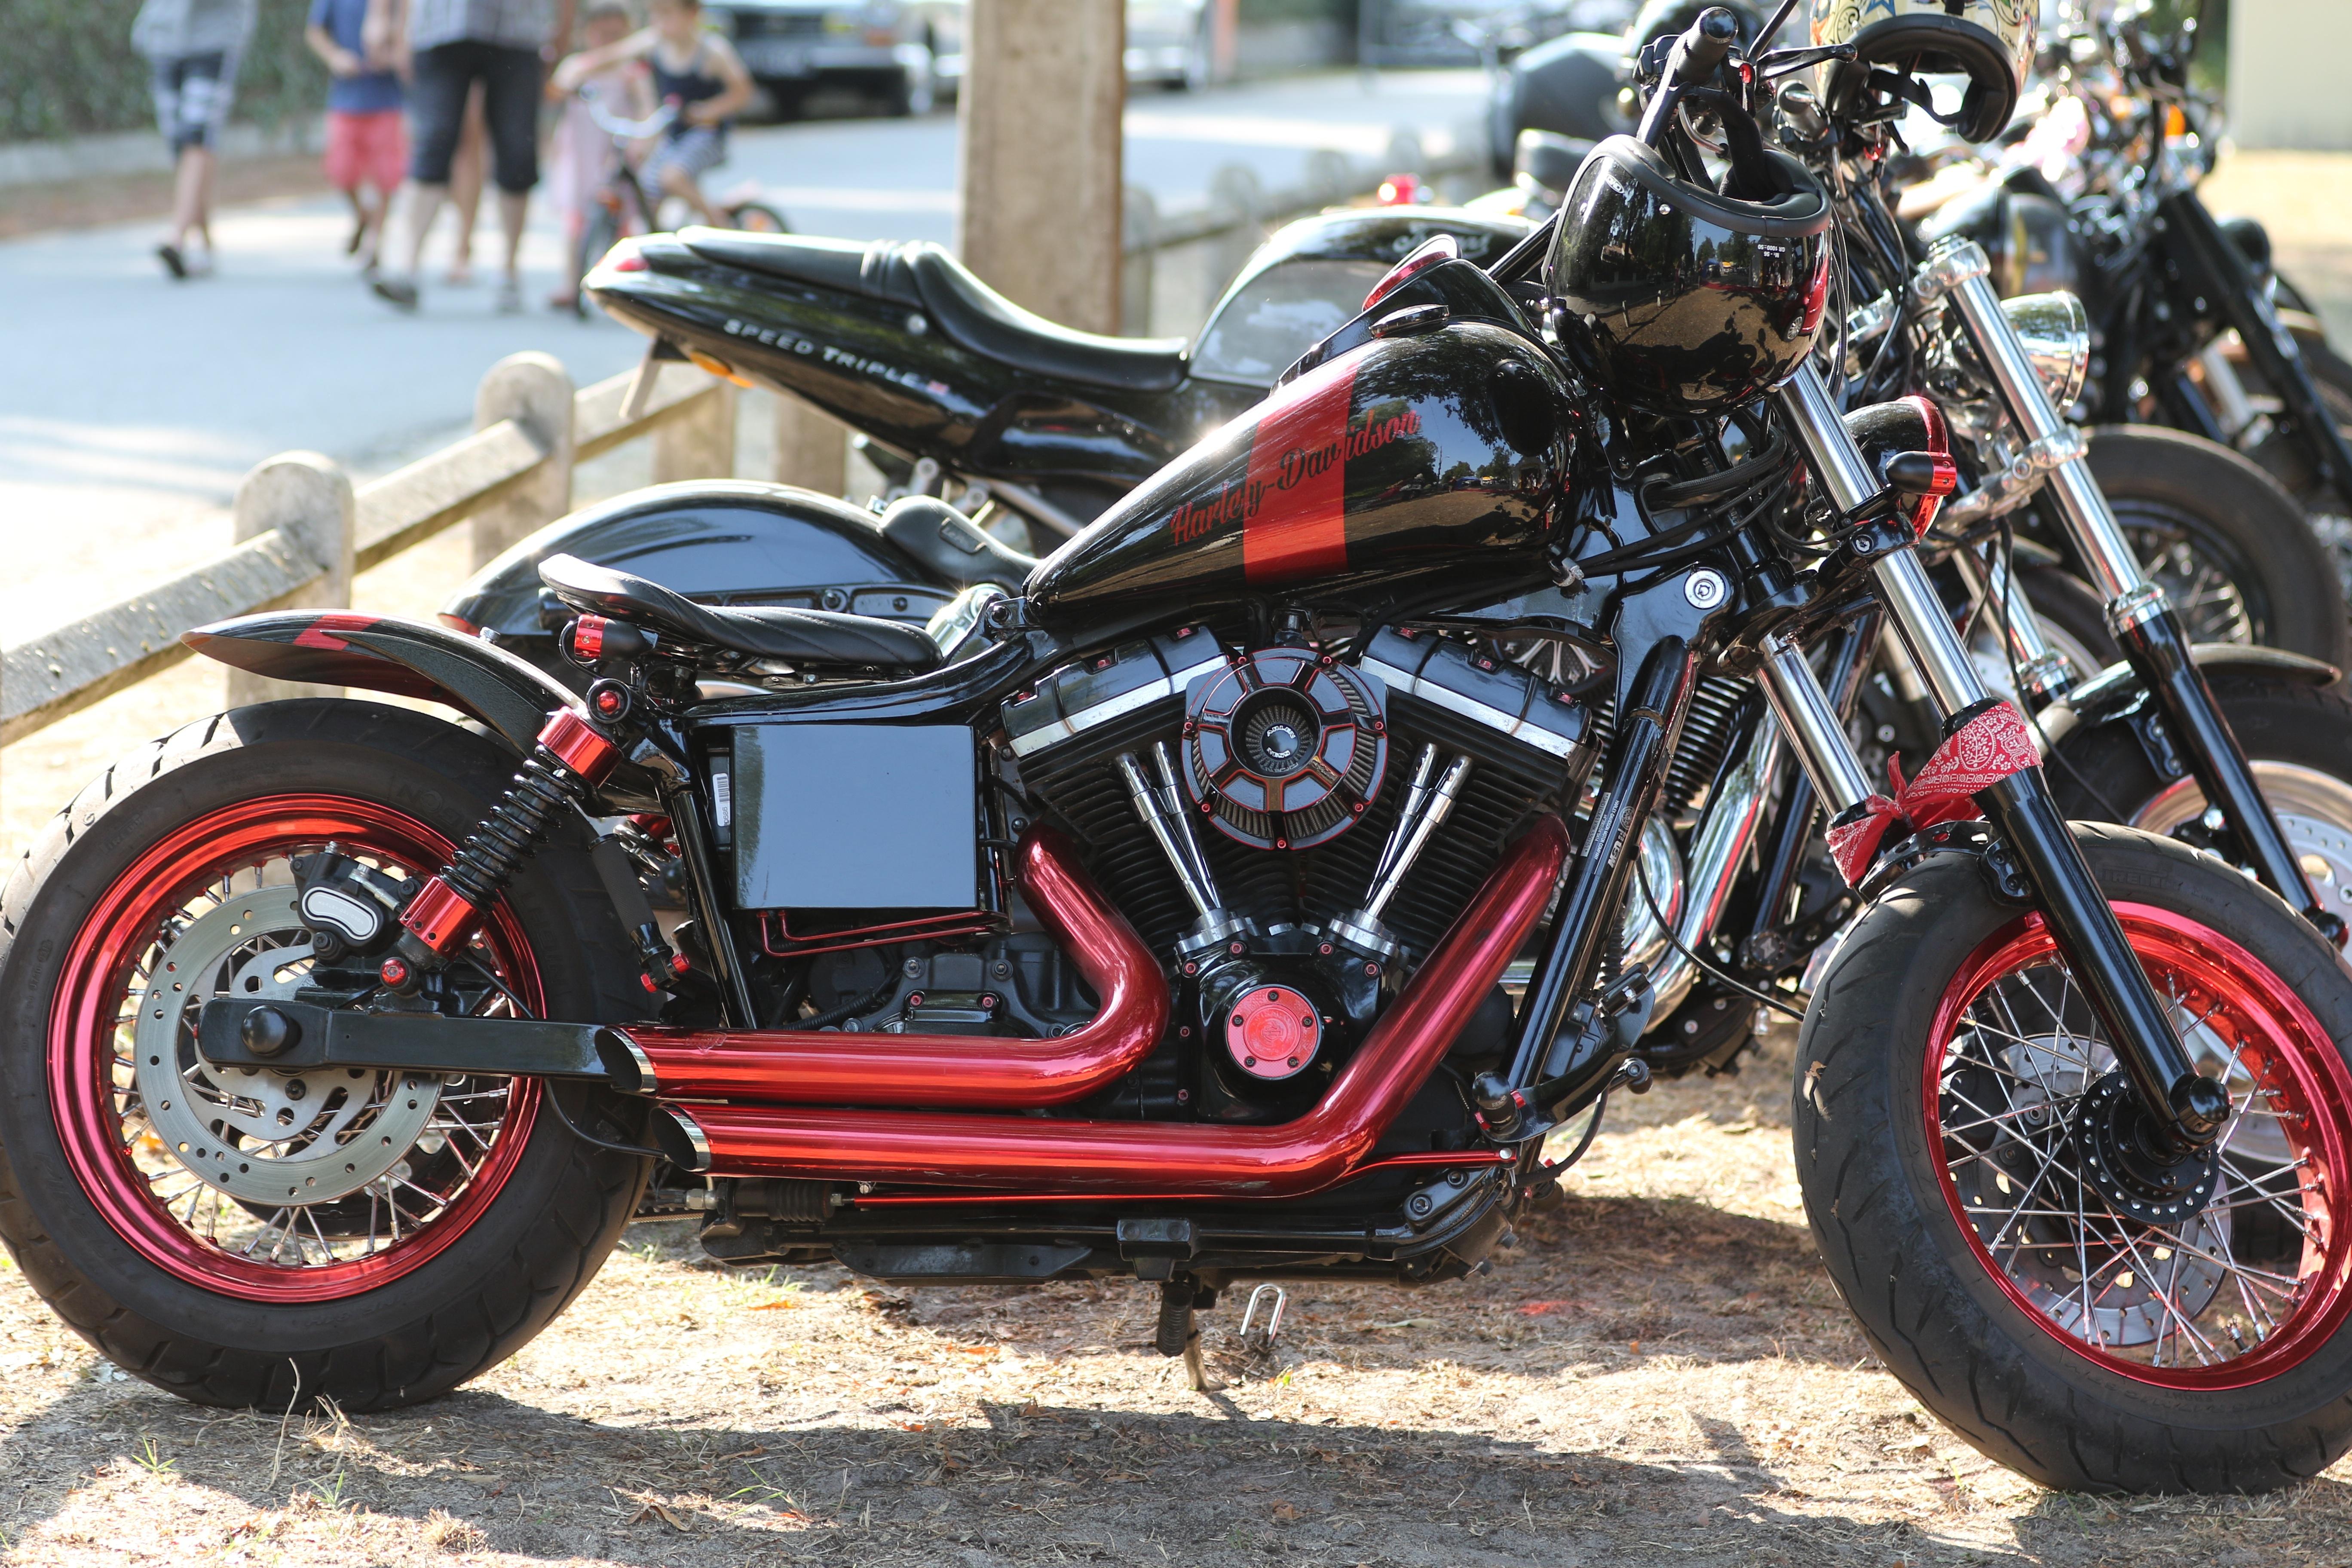 Car Wheel Red Vehicle Motorcycle Black Custom Chopper Nab Harley Davidson  Cruiser Motorcycling Land Automobile S